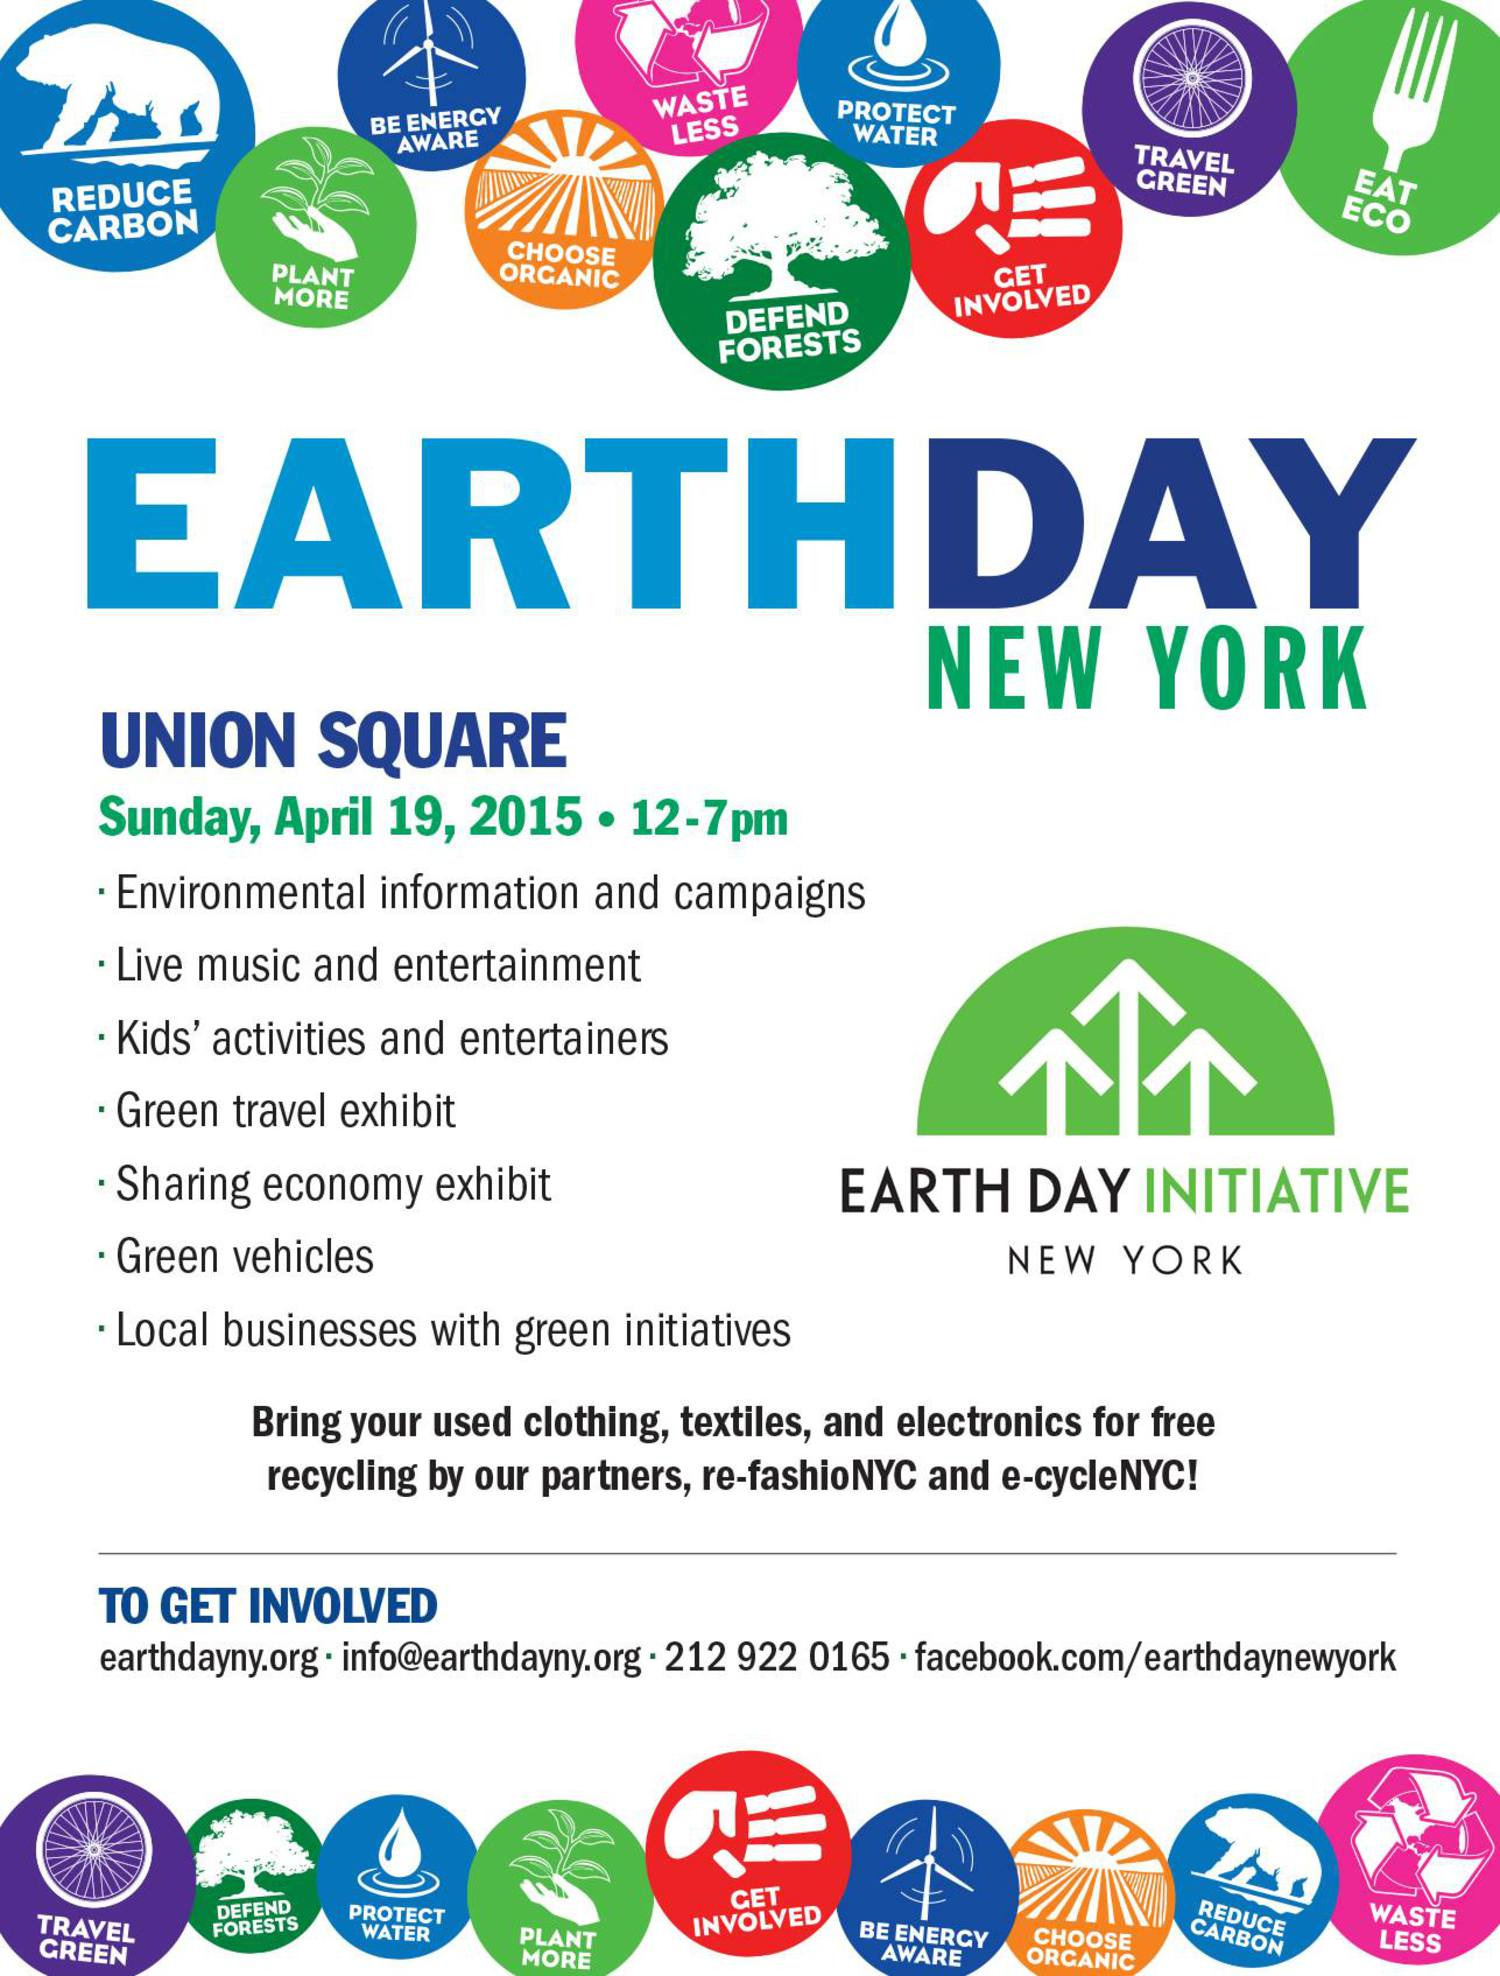 25th Annual Earth Day New York Celebration in Union Square